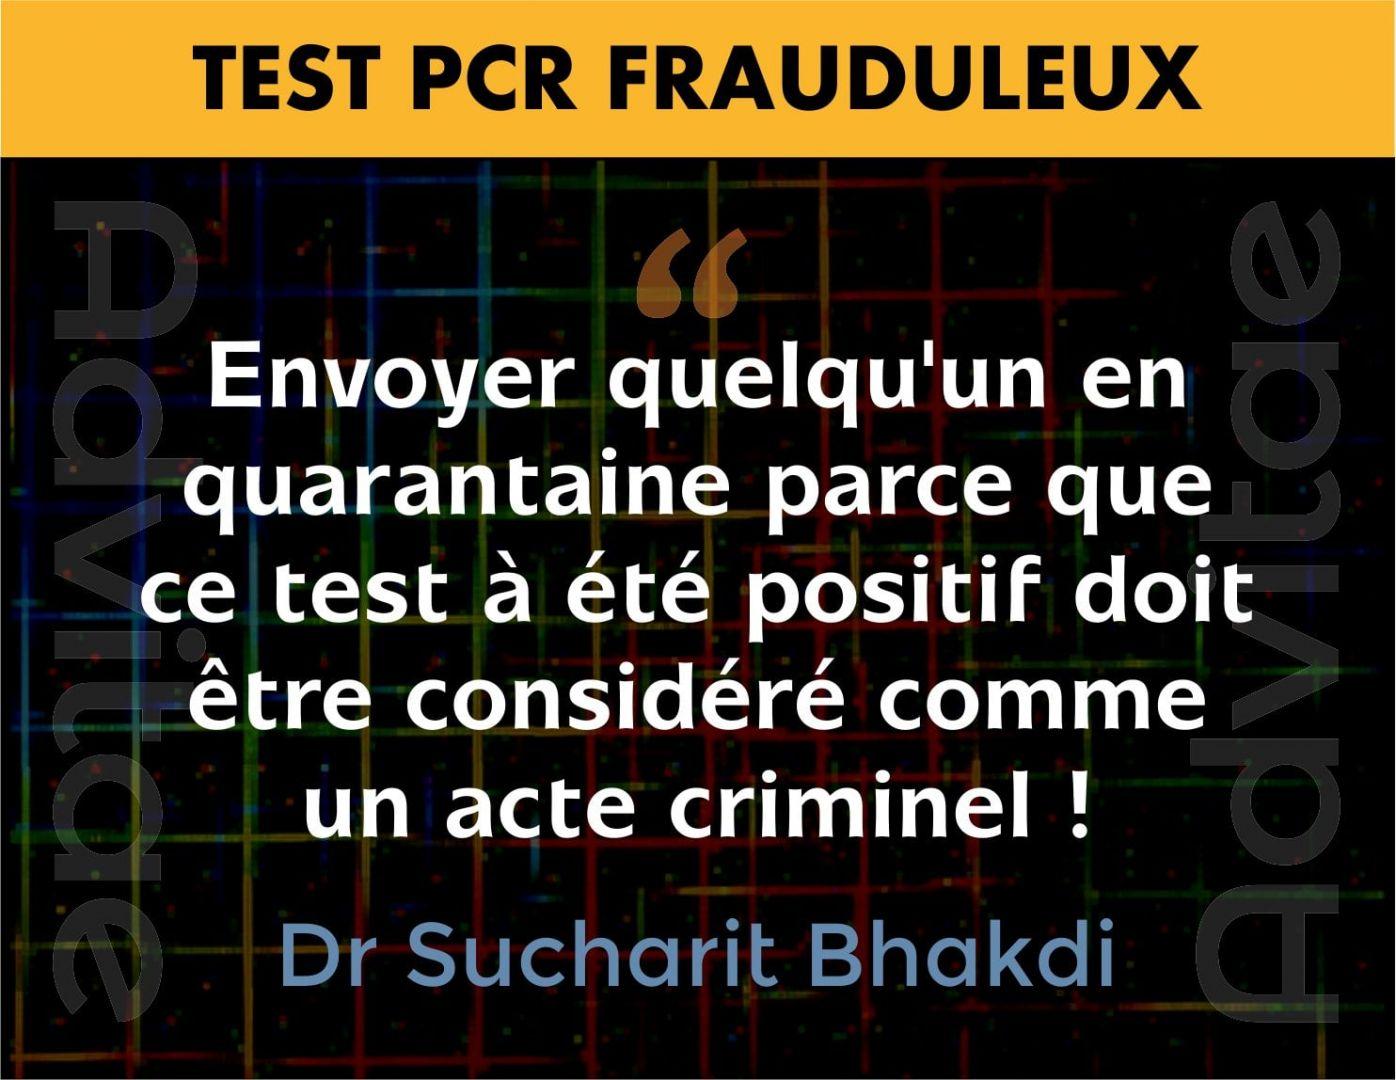 Bhakdi - Envoyer en quarantaine quelqu'un qui test positif est criminel